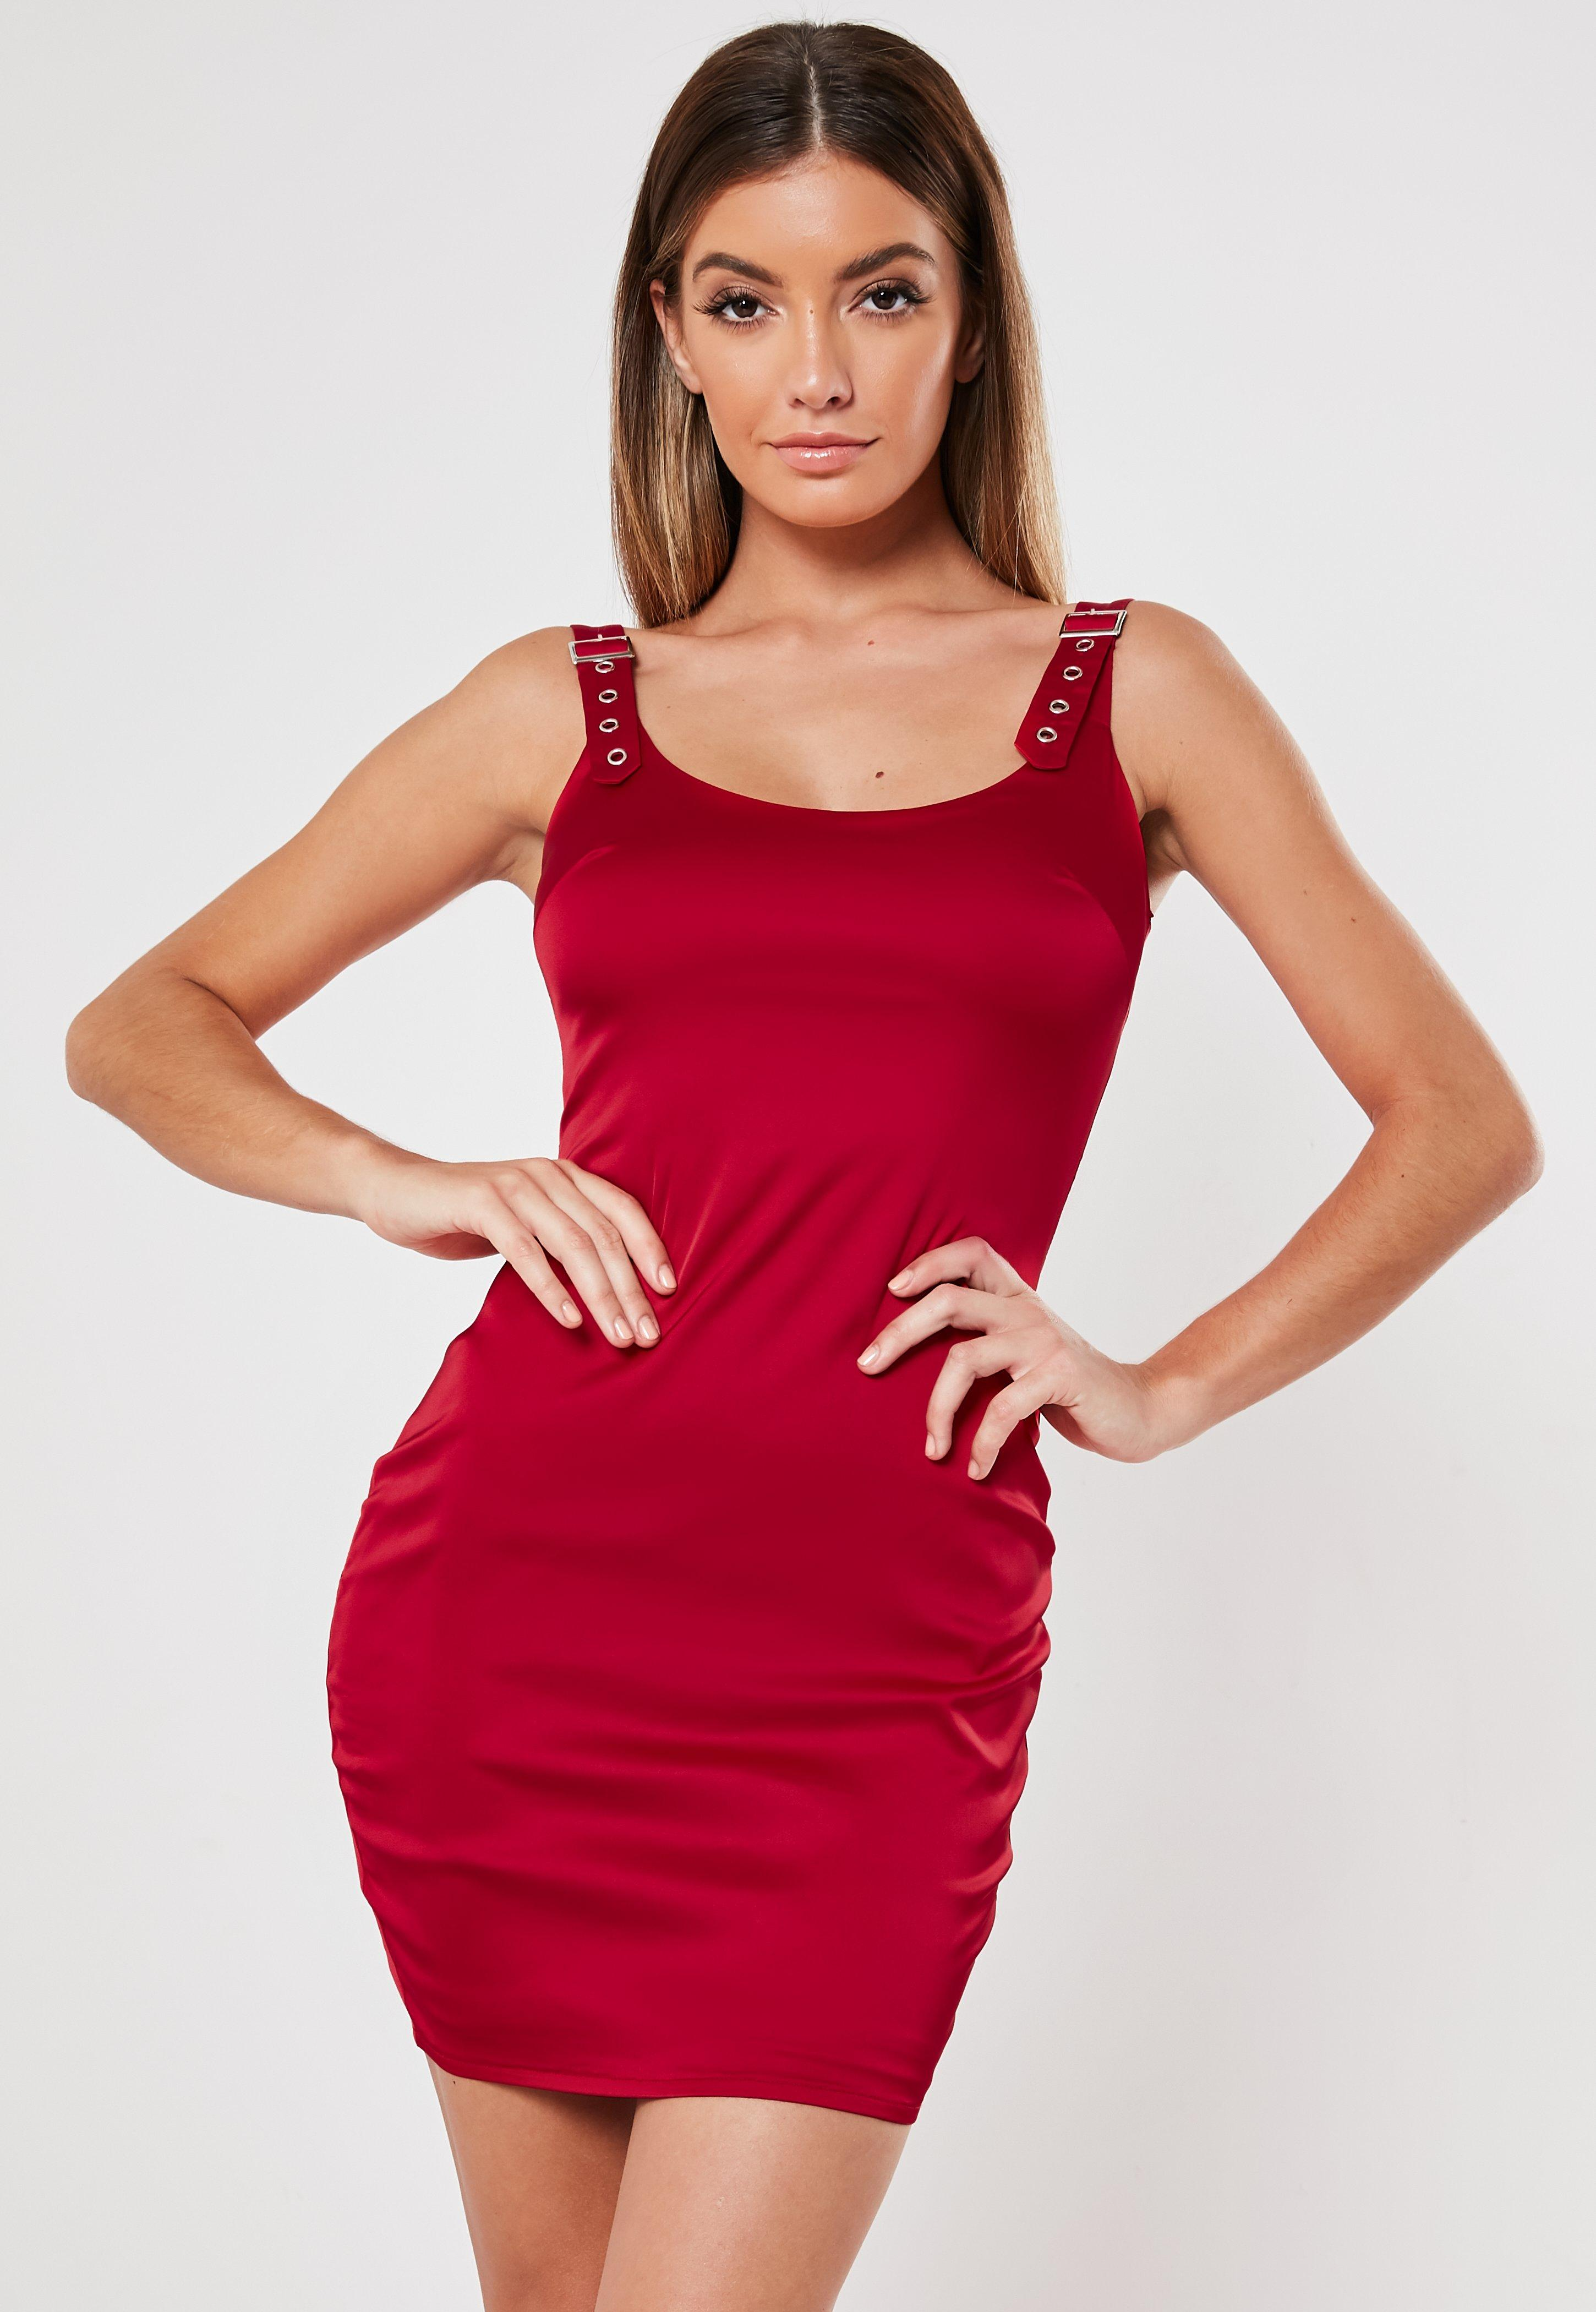 51c7c976af3928 Red Buckle Strap Satin Bodycon Mini Dress